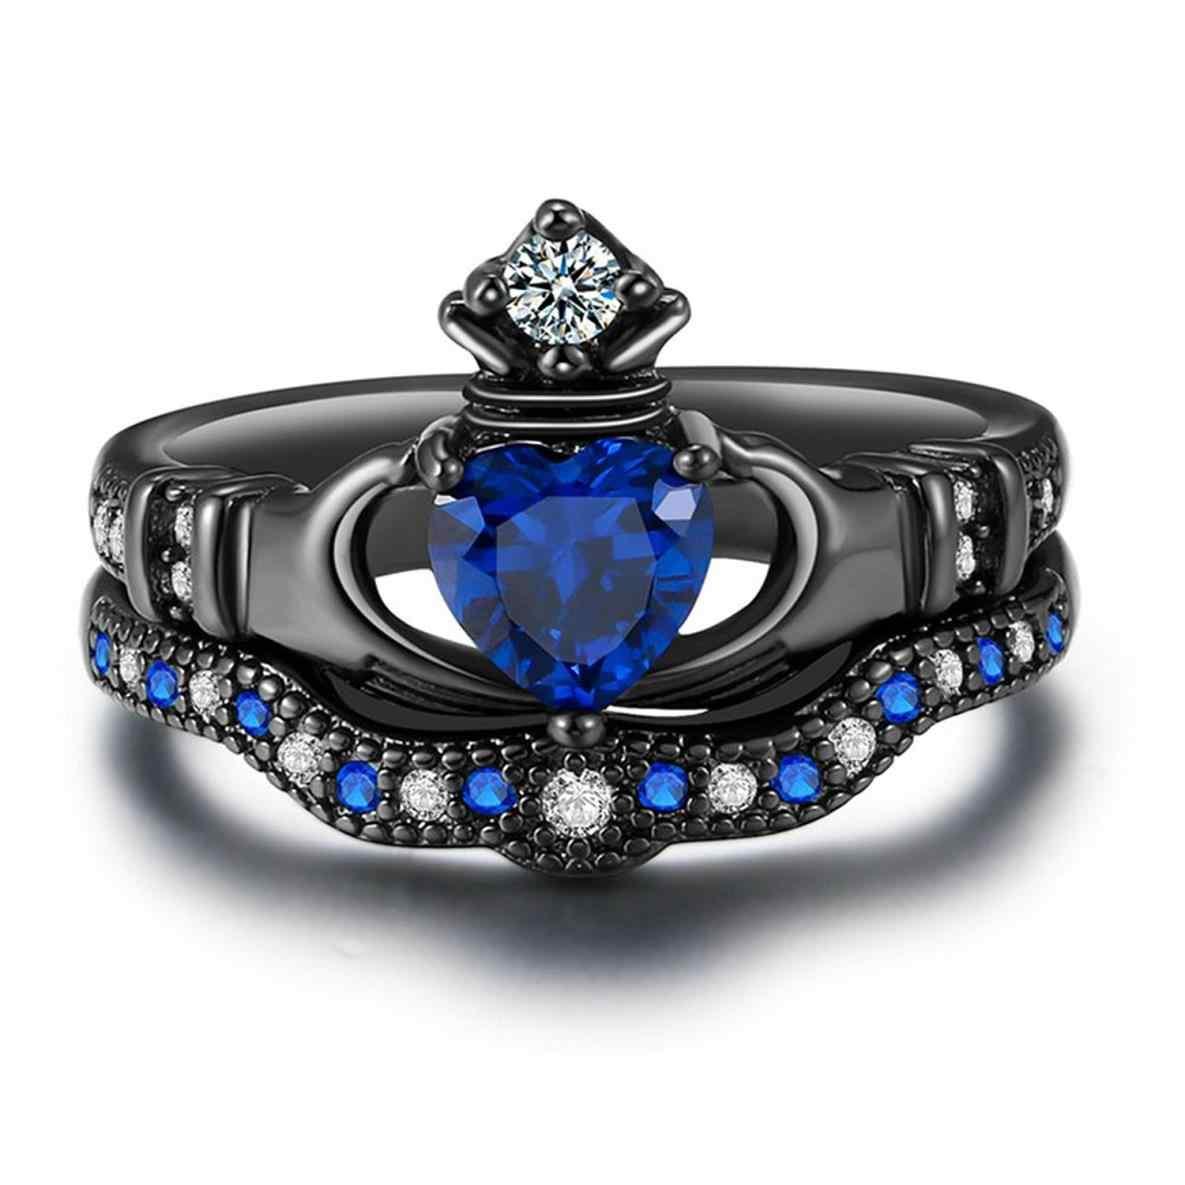 1185x1185 Claddagh Ring Drawing